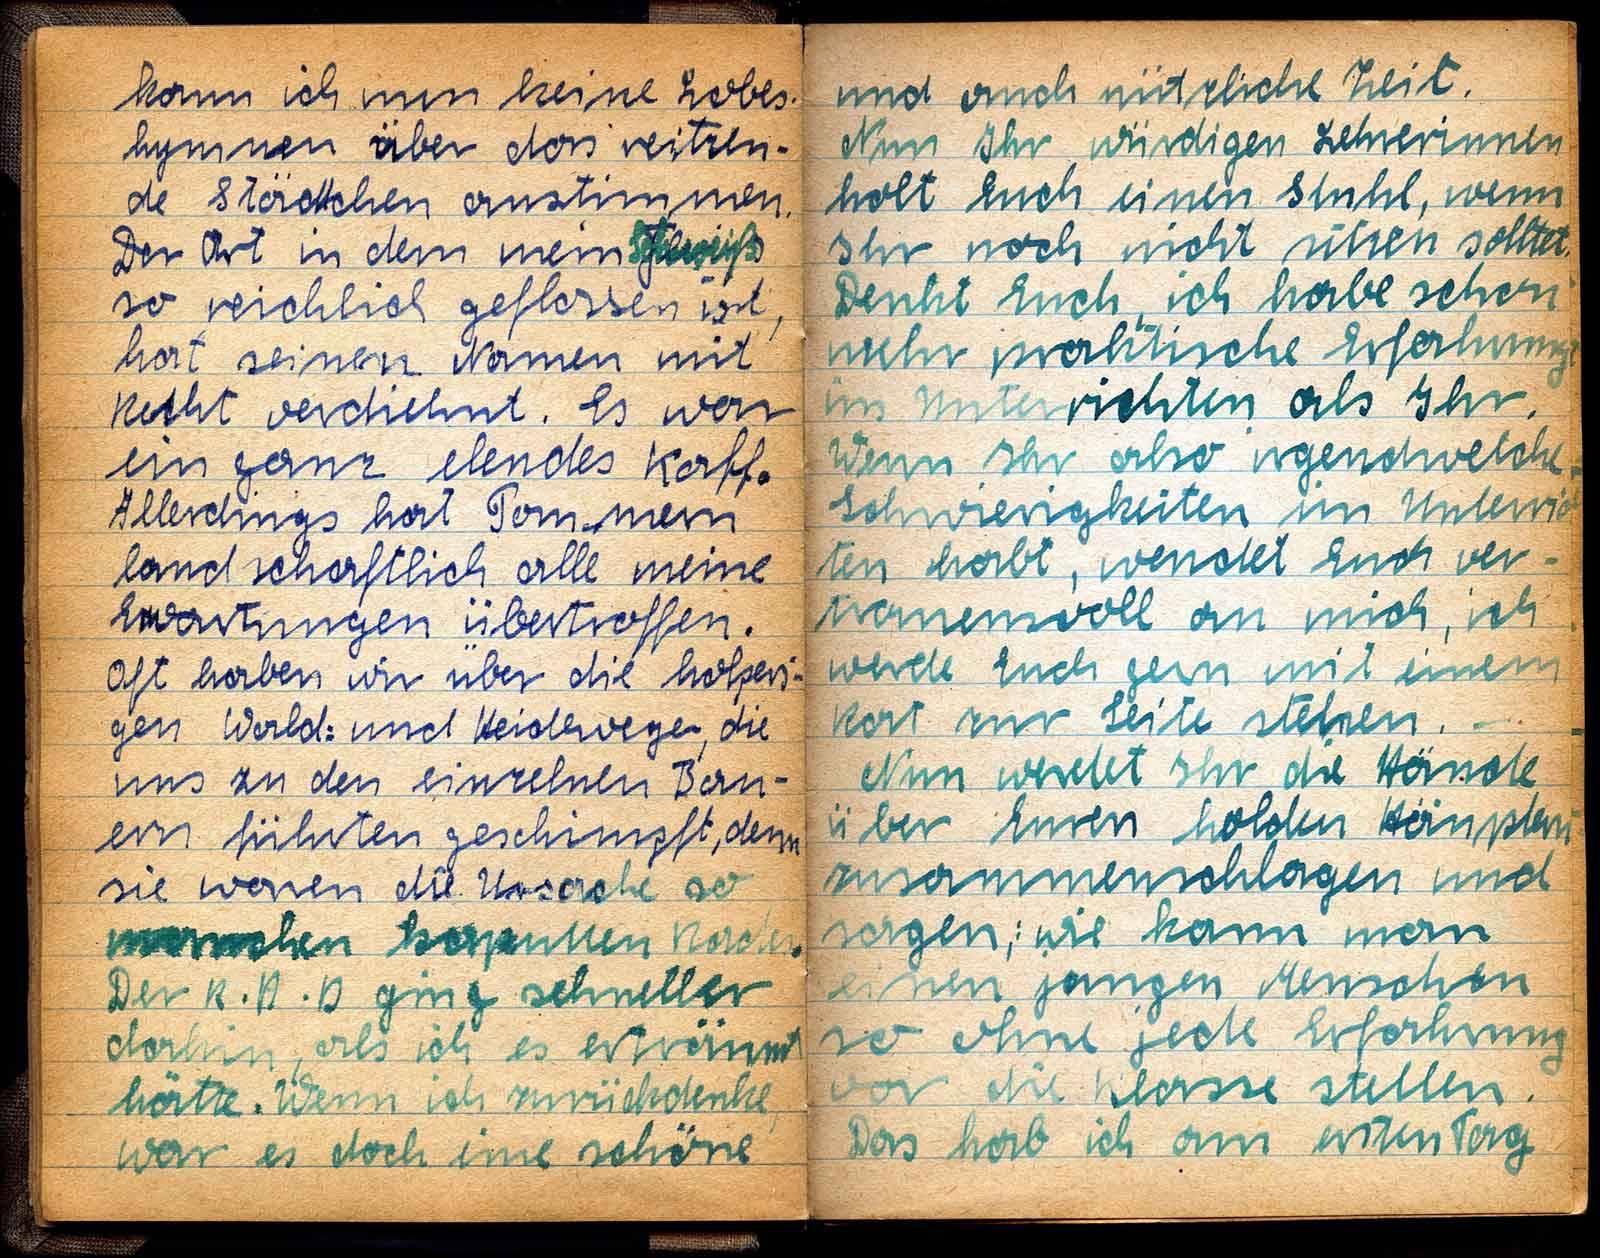 Jugend 1918-1945 | Archiv